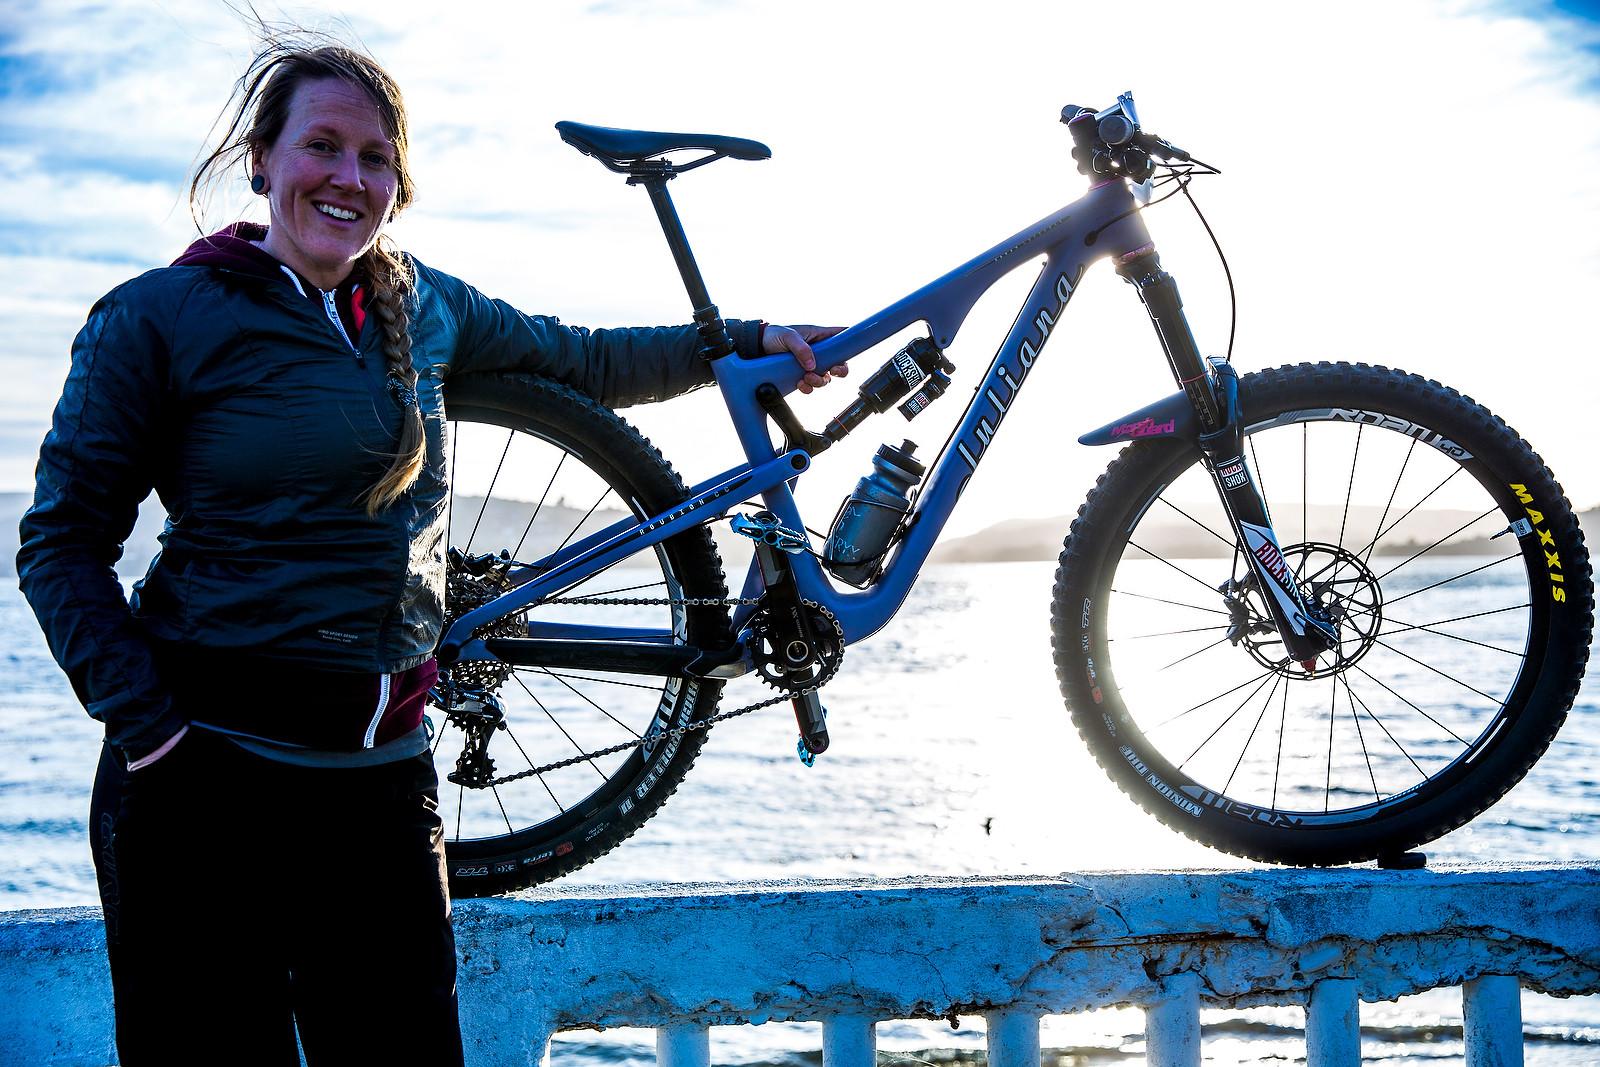 Sarah Leishman Juliana Roubion - PIT BITS - Enduro World Series, Corral, Chile - Mountain Biking Pictures - Vital MTB